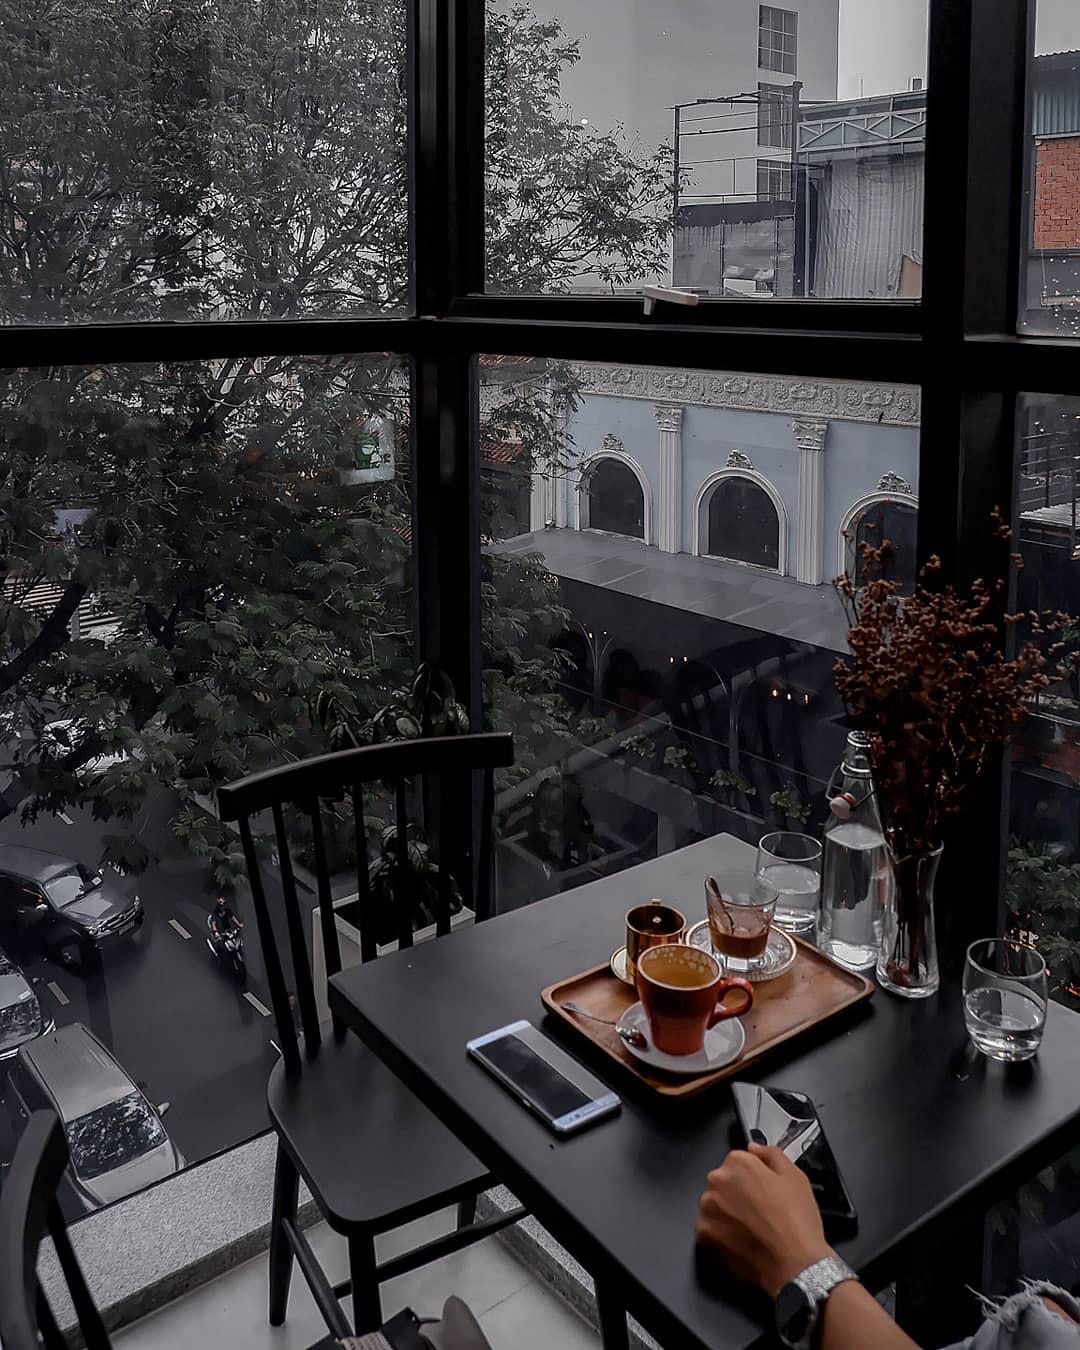 sai-gon-cafe-dep-tai-sai-gon-infinity-coffee-11